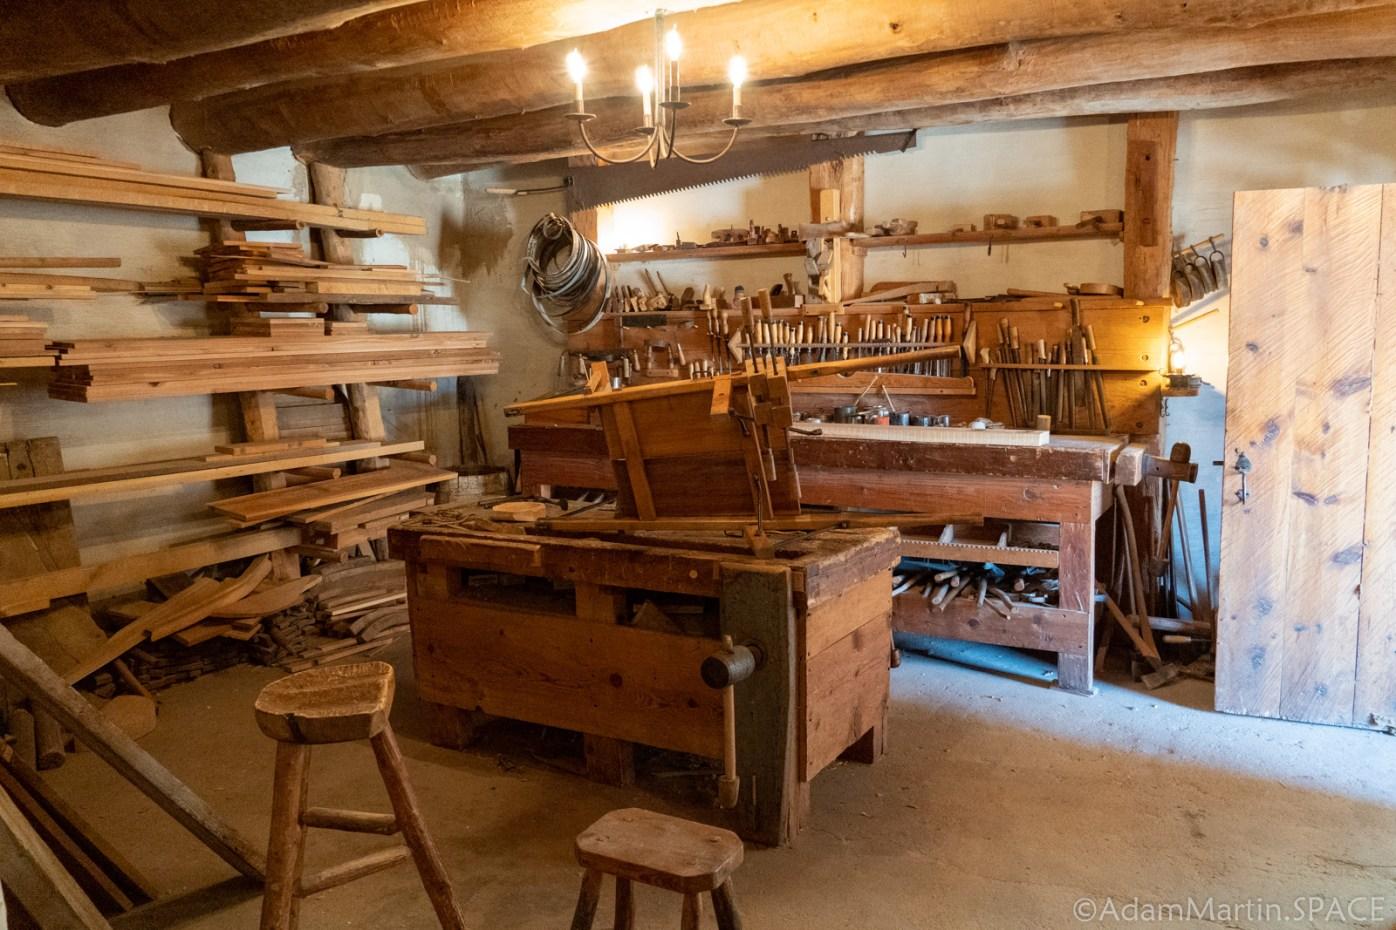 Bent's Old Fort National Historic Site - Carpentry Shop